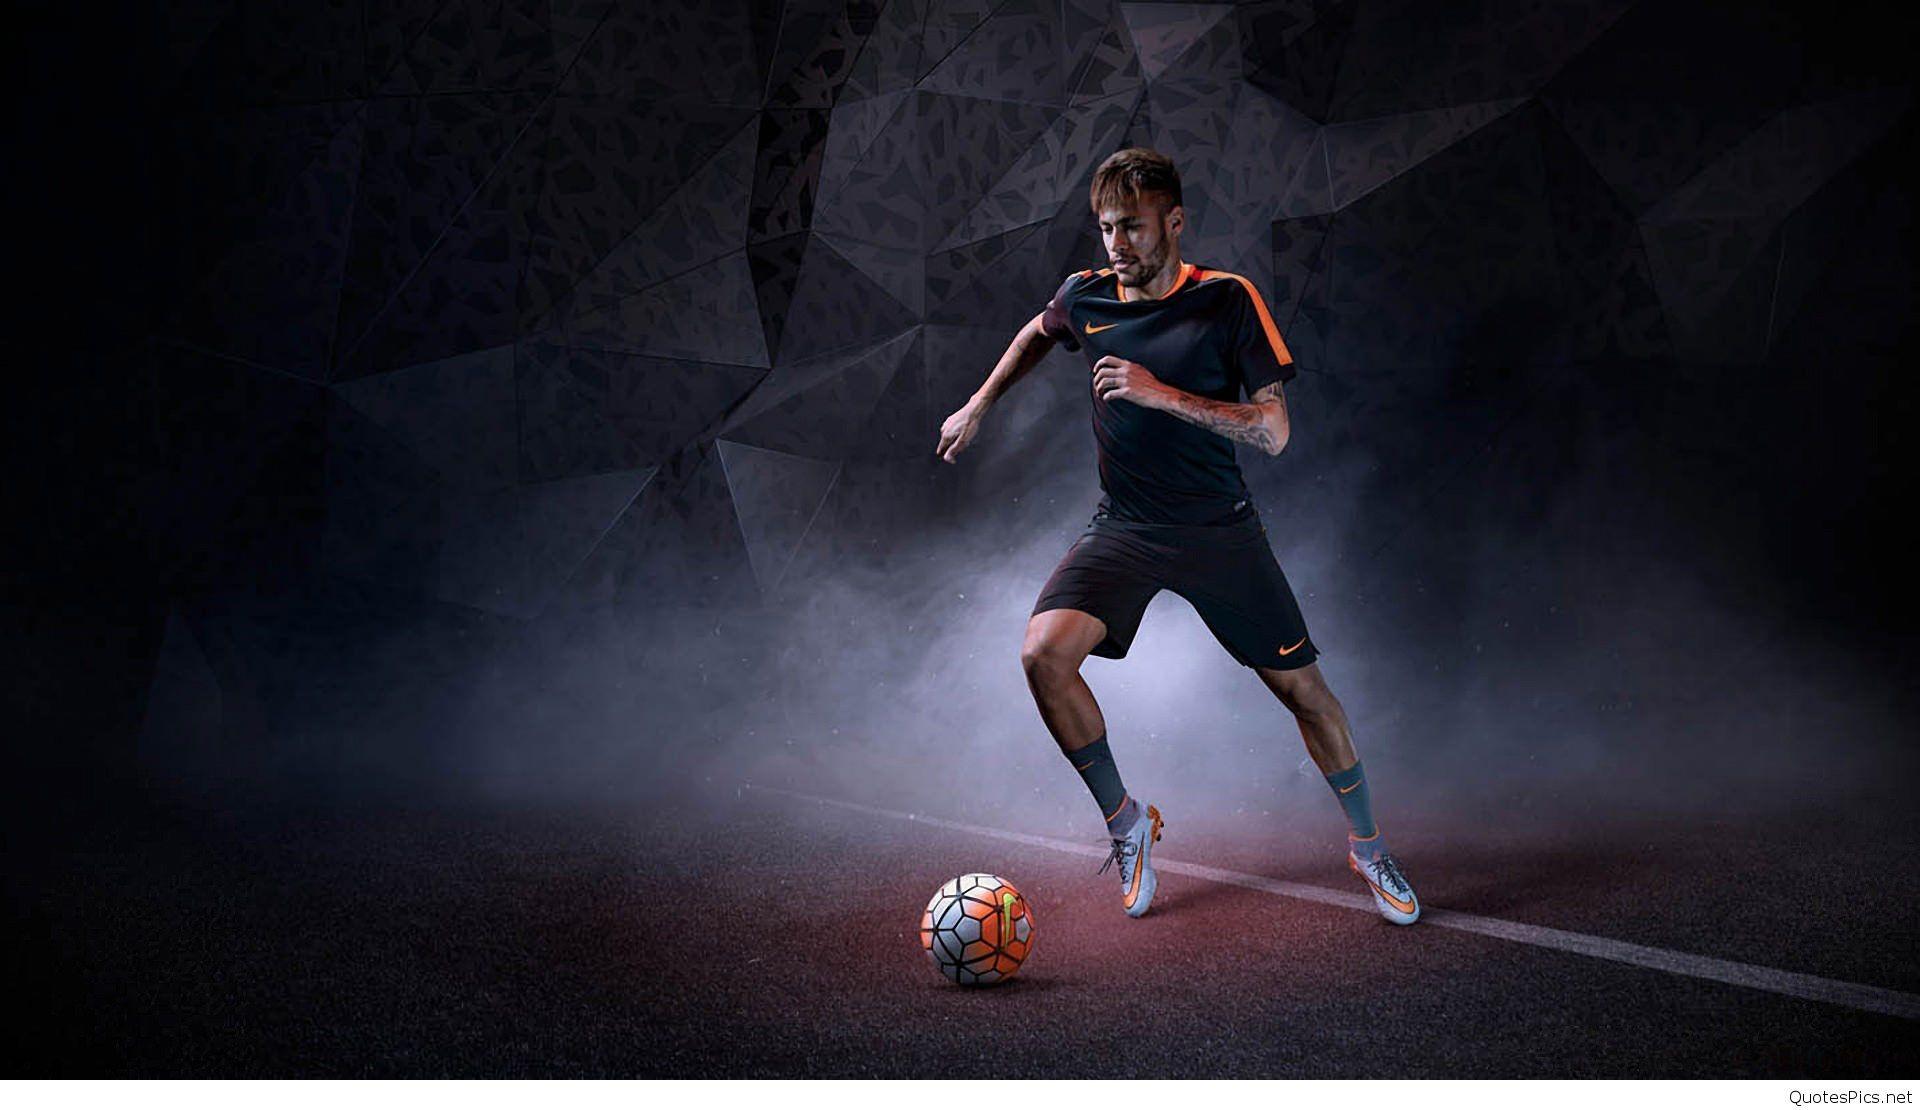 Nike hypervenom wallpaper